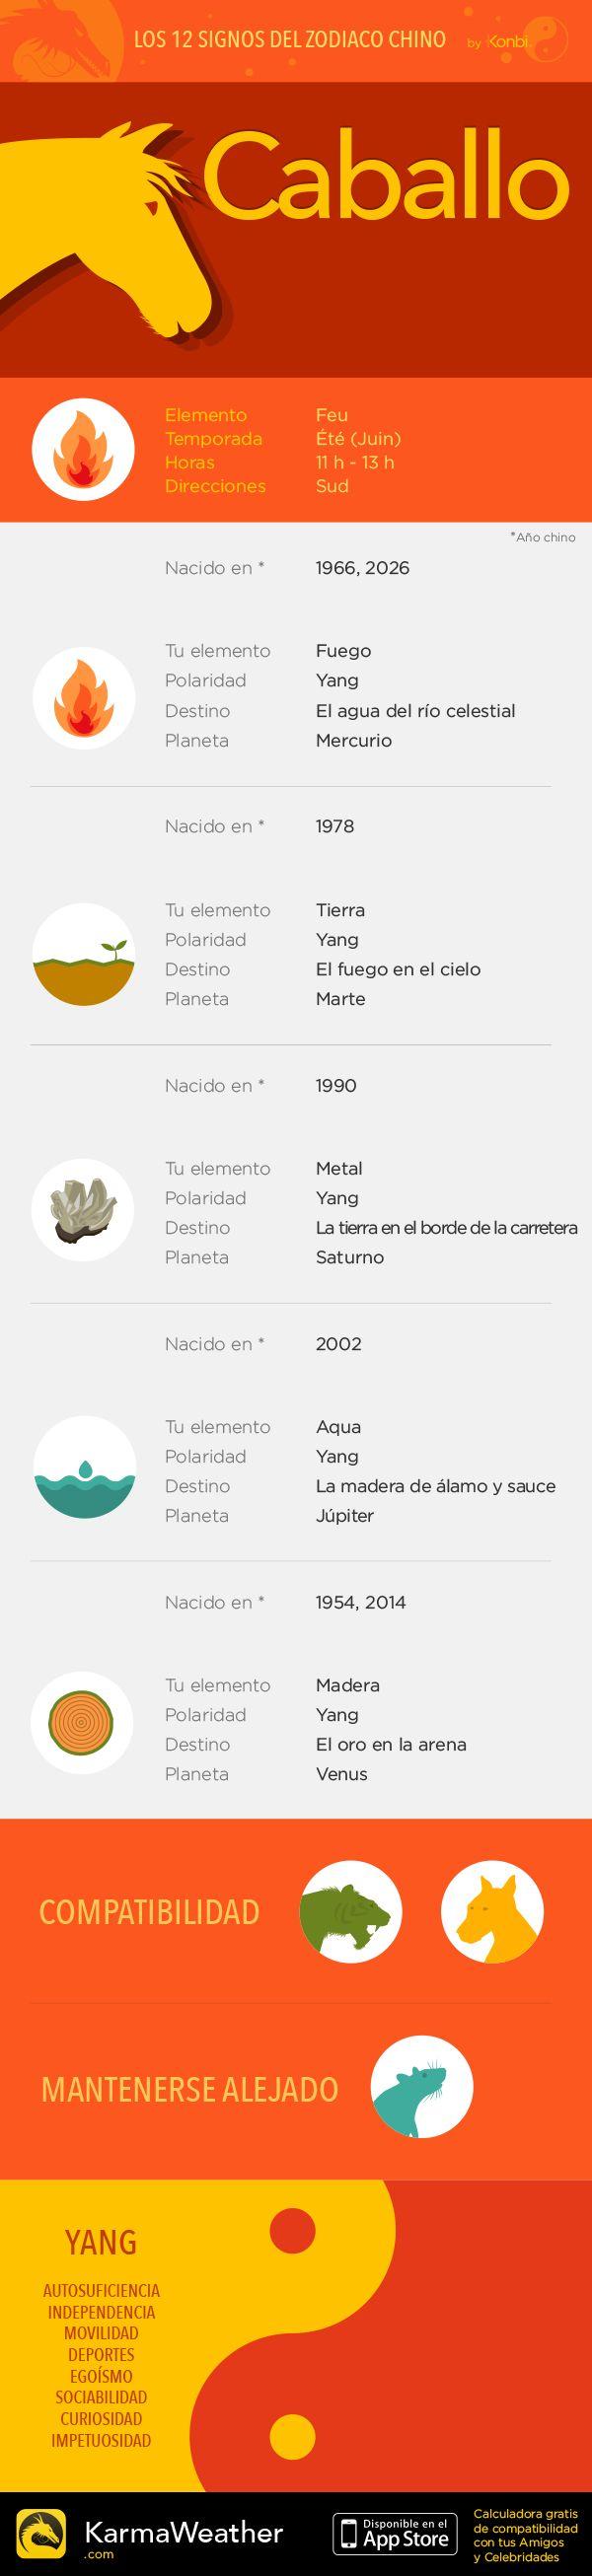 Hor scopo de los 12 signos del zodiaco chino caballo mi karma pinterest feng shui zodiac - Los signos del zodiaco en orden ...